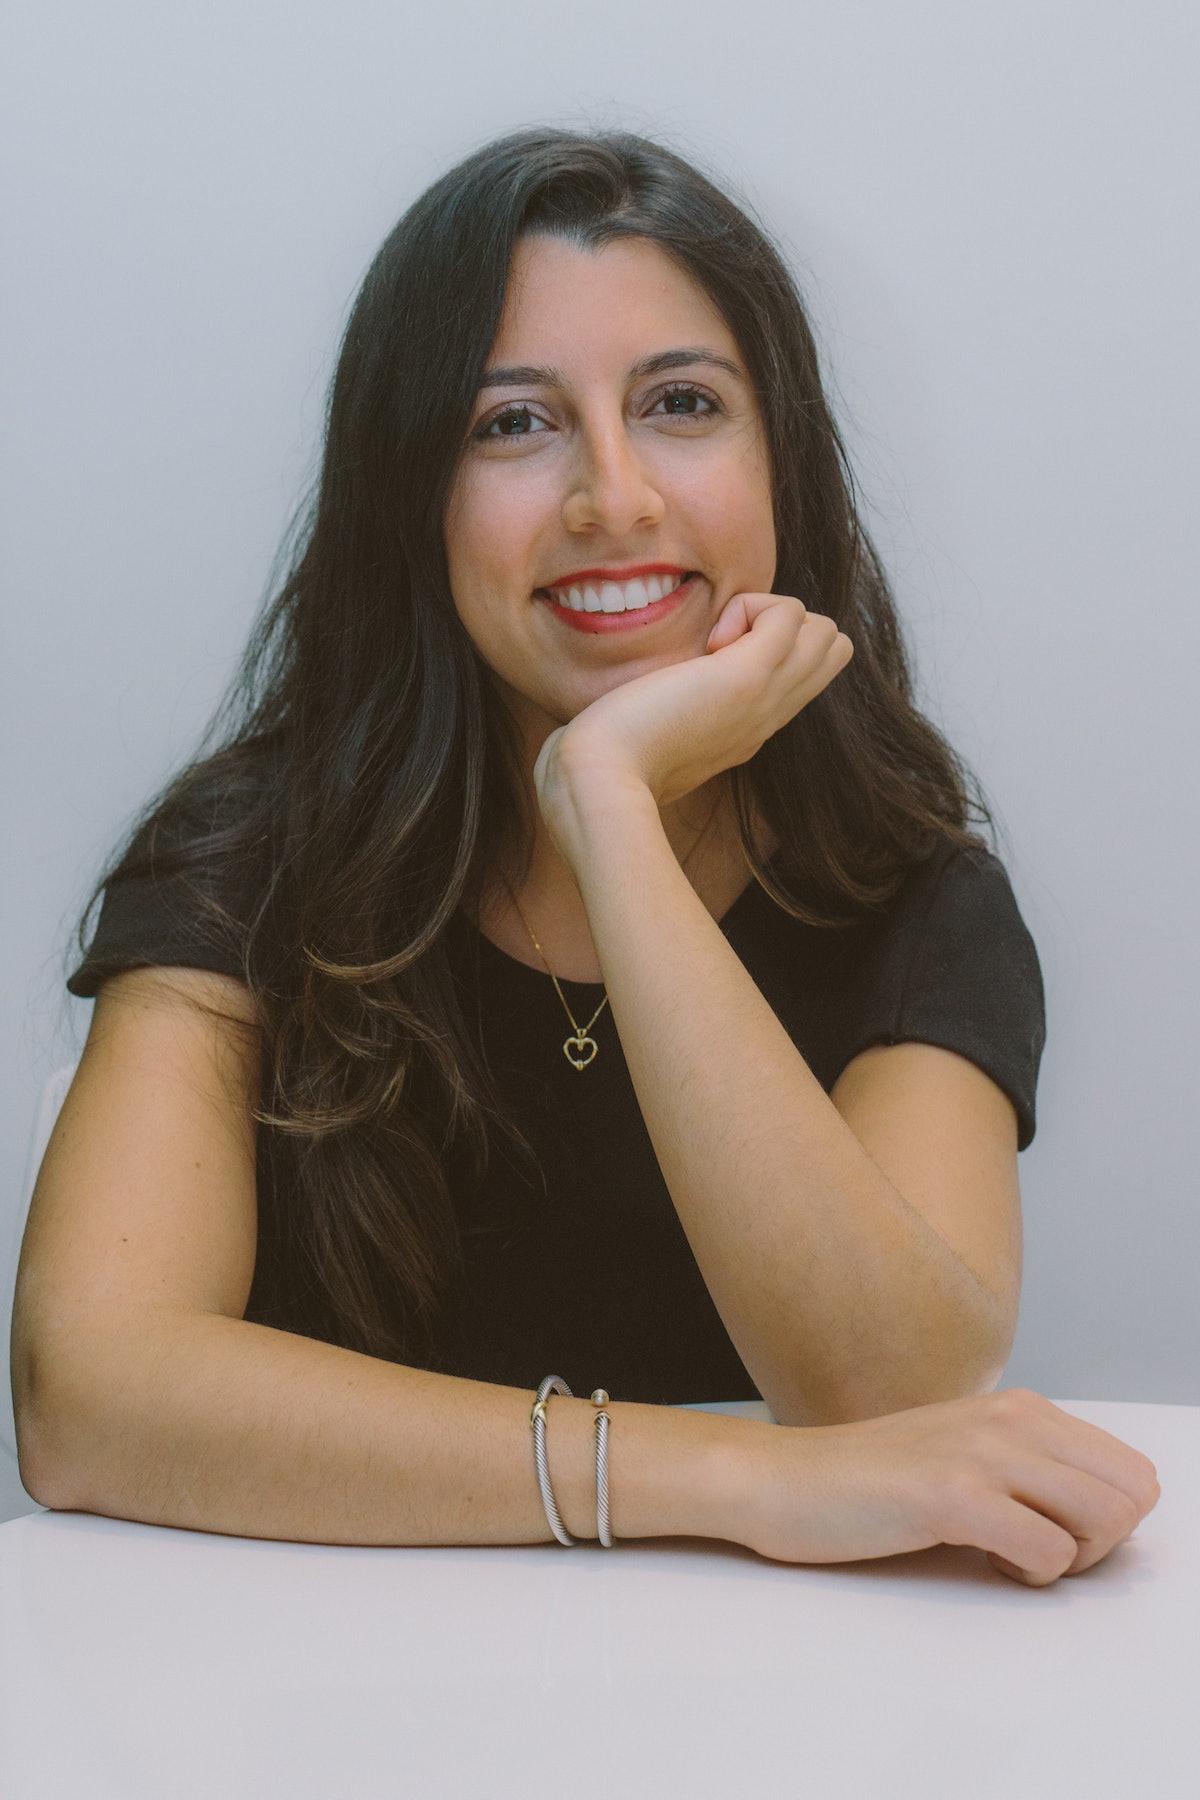 Candice Jalili